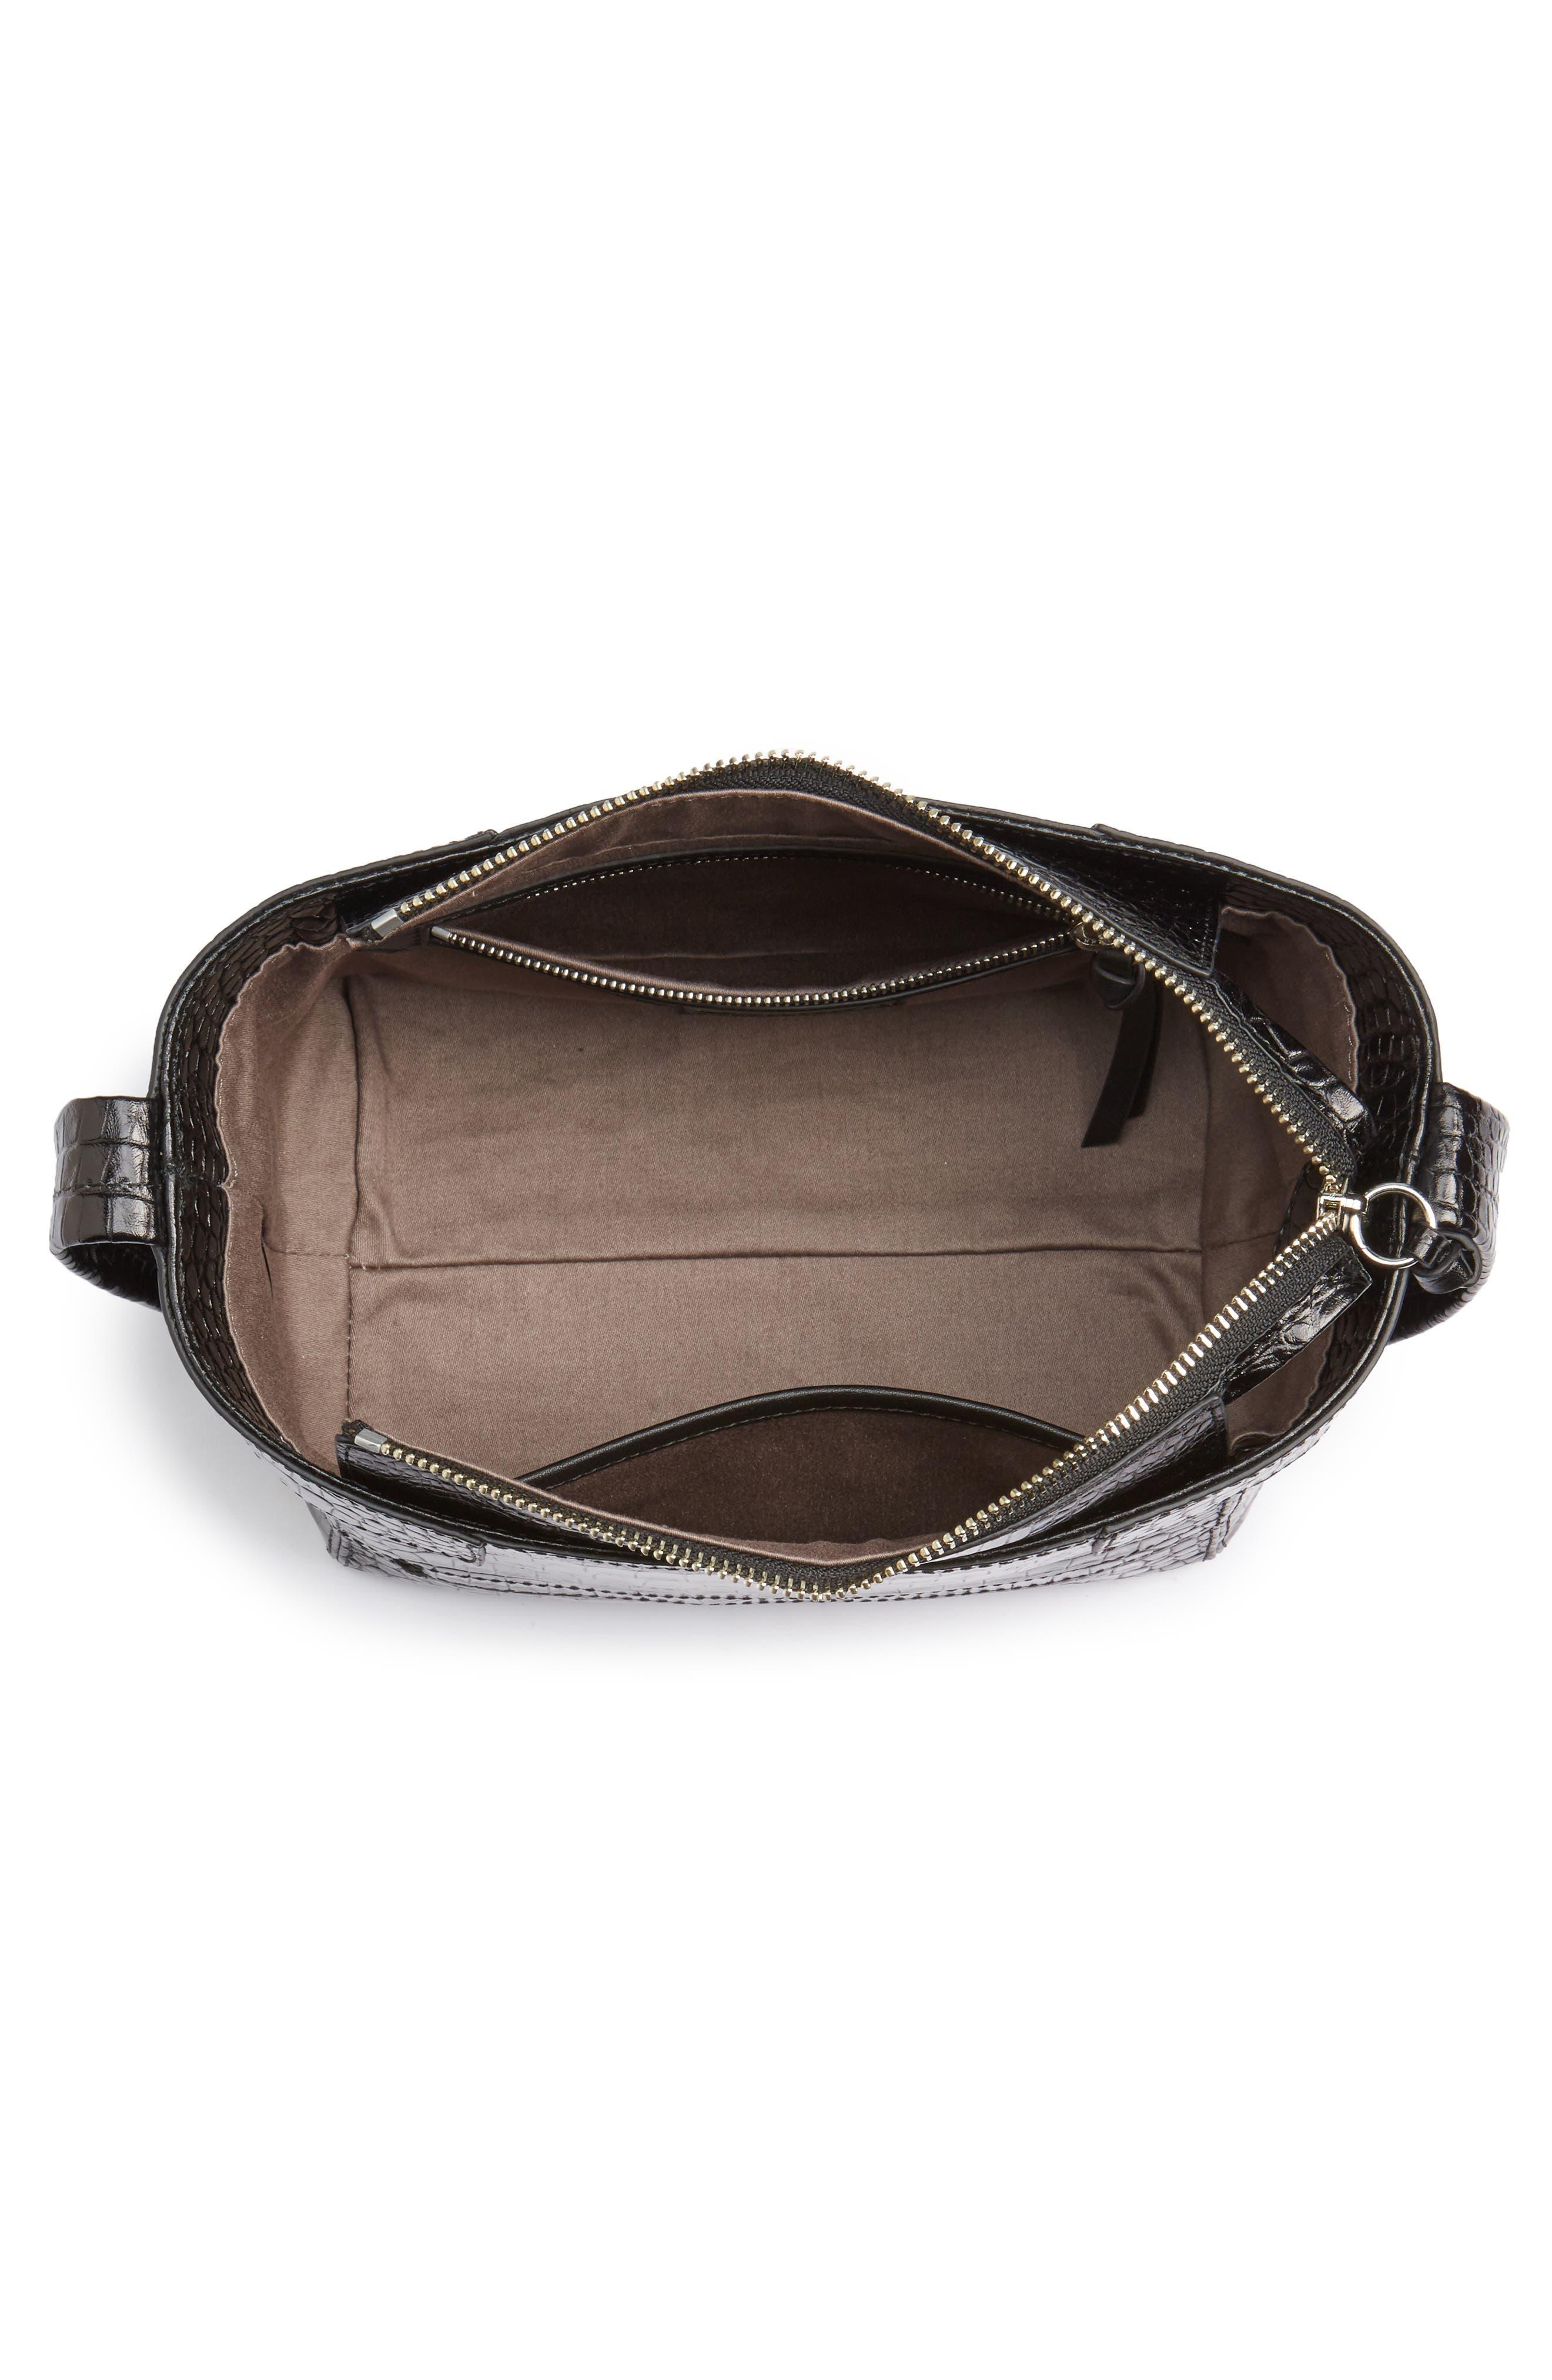 Keely Leather Crossbody Bag,                             Alternate thumbnail 4, color,                             Black